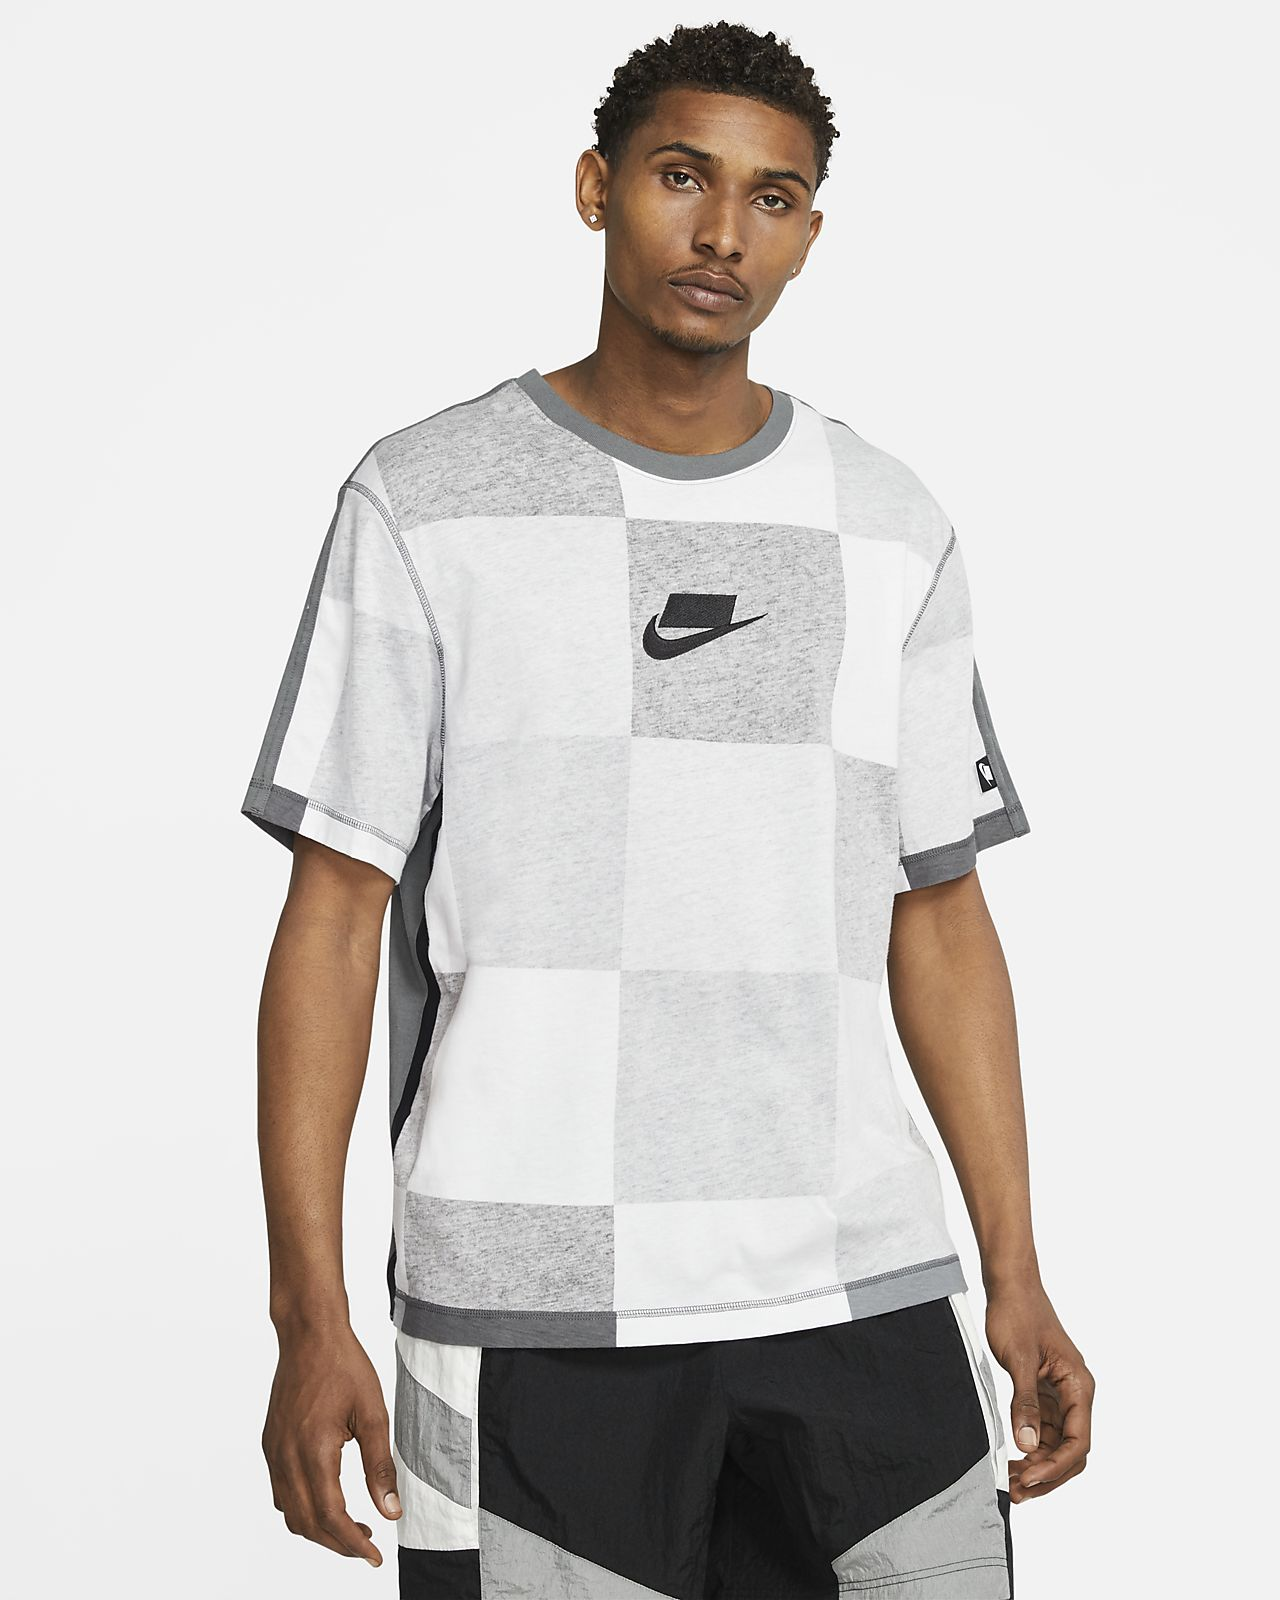 Prenda para la parte superior de manga corta tejida para hombre Nike Sportswear NSW